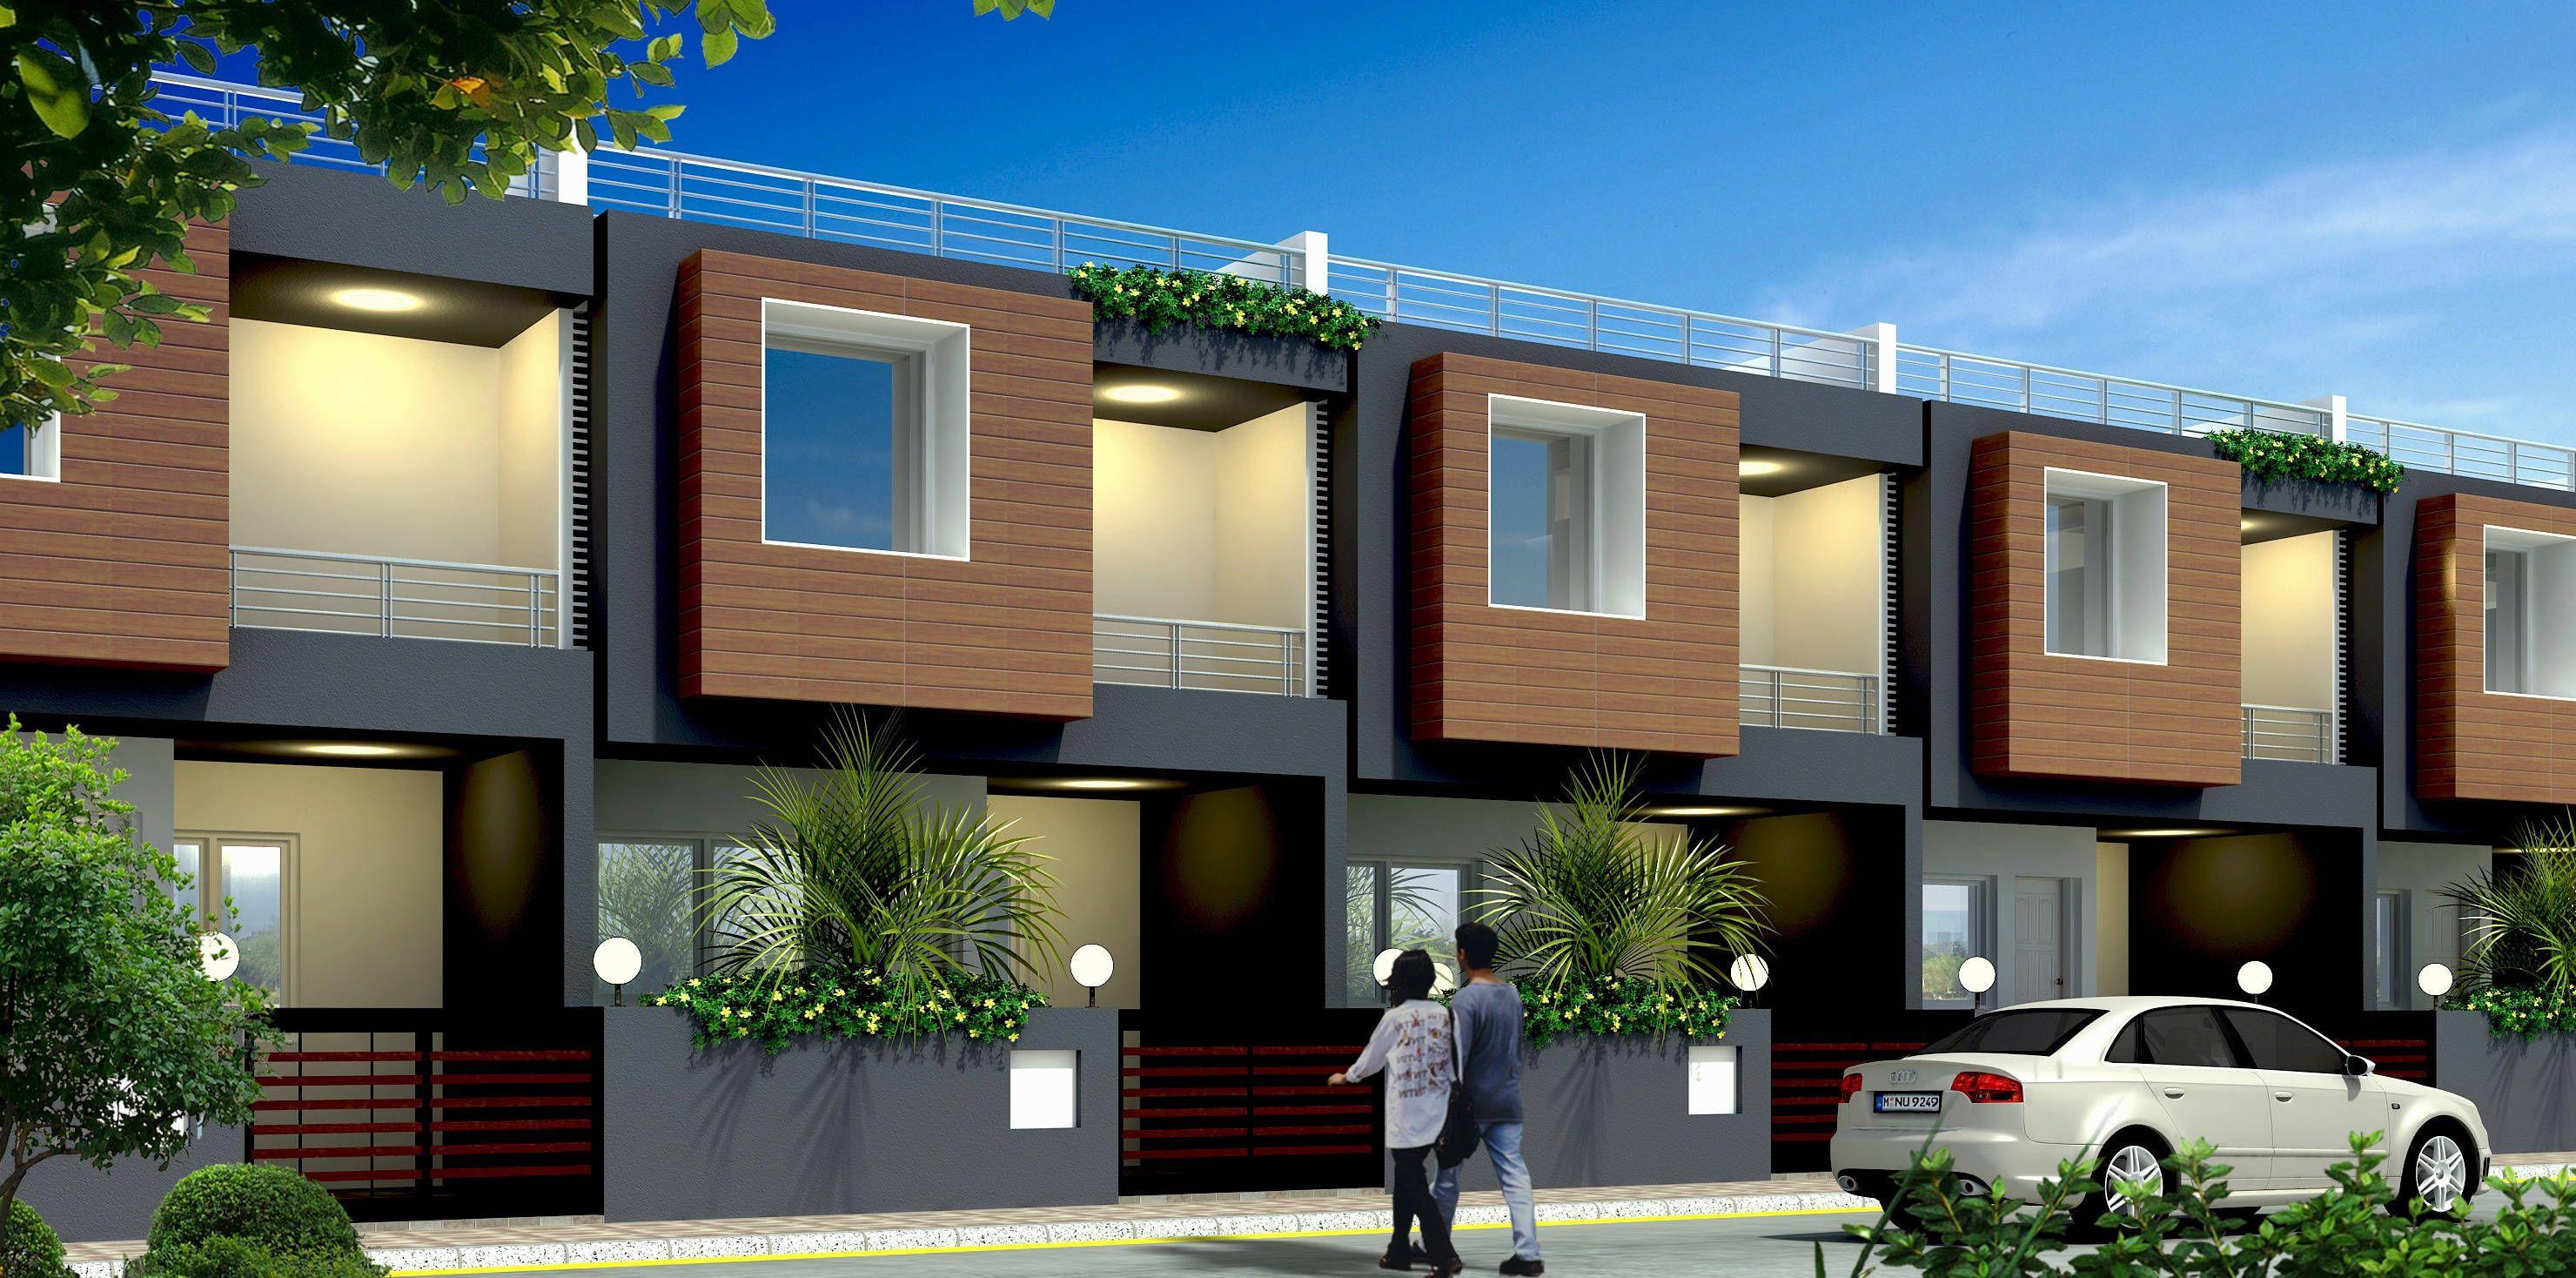 surya-row-house-elevation-3707878.jpeg 2,960×1,468 pixels ...